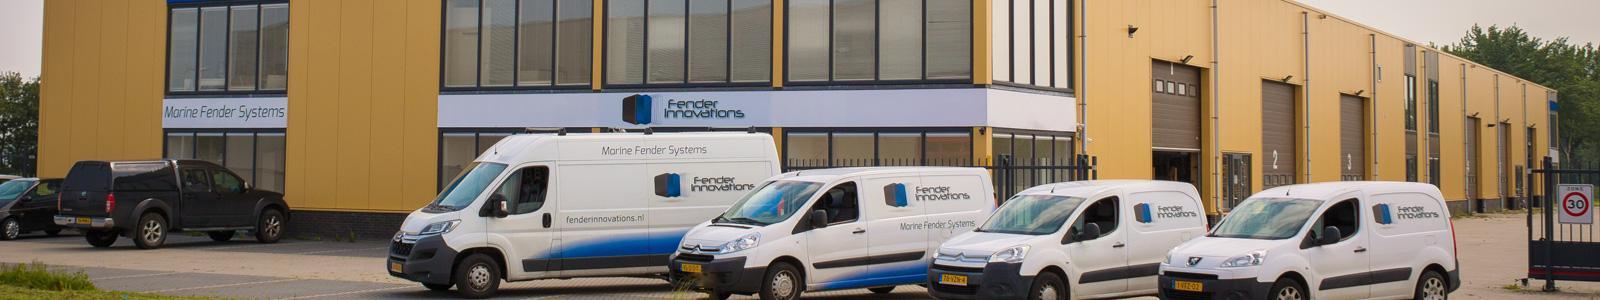 Fender Innovations -gepatenteerde fendersystemen